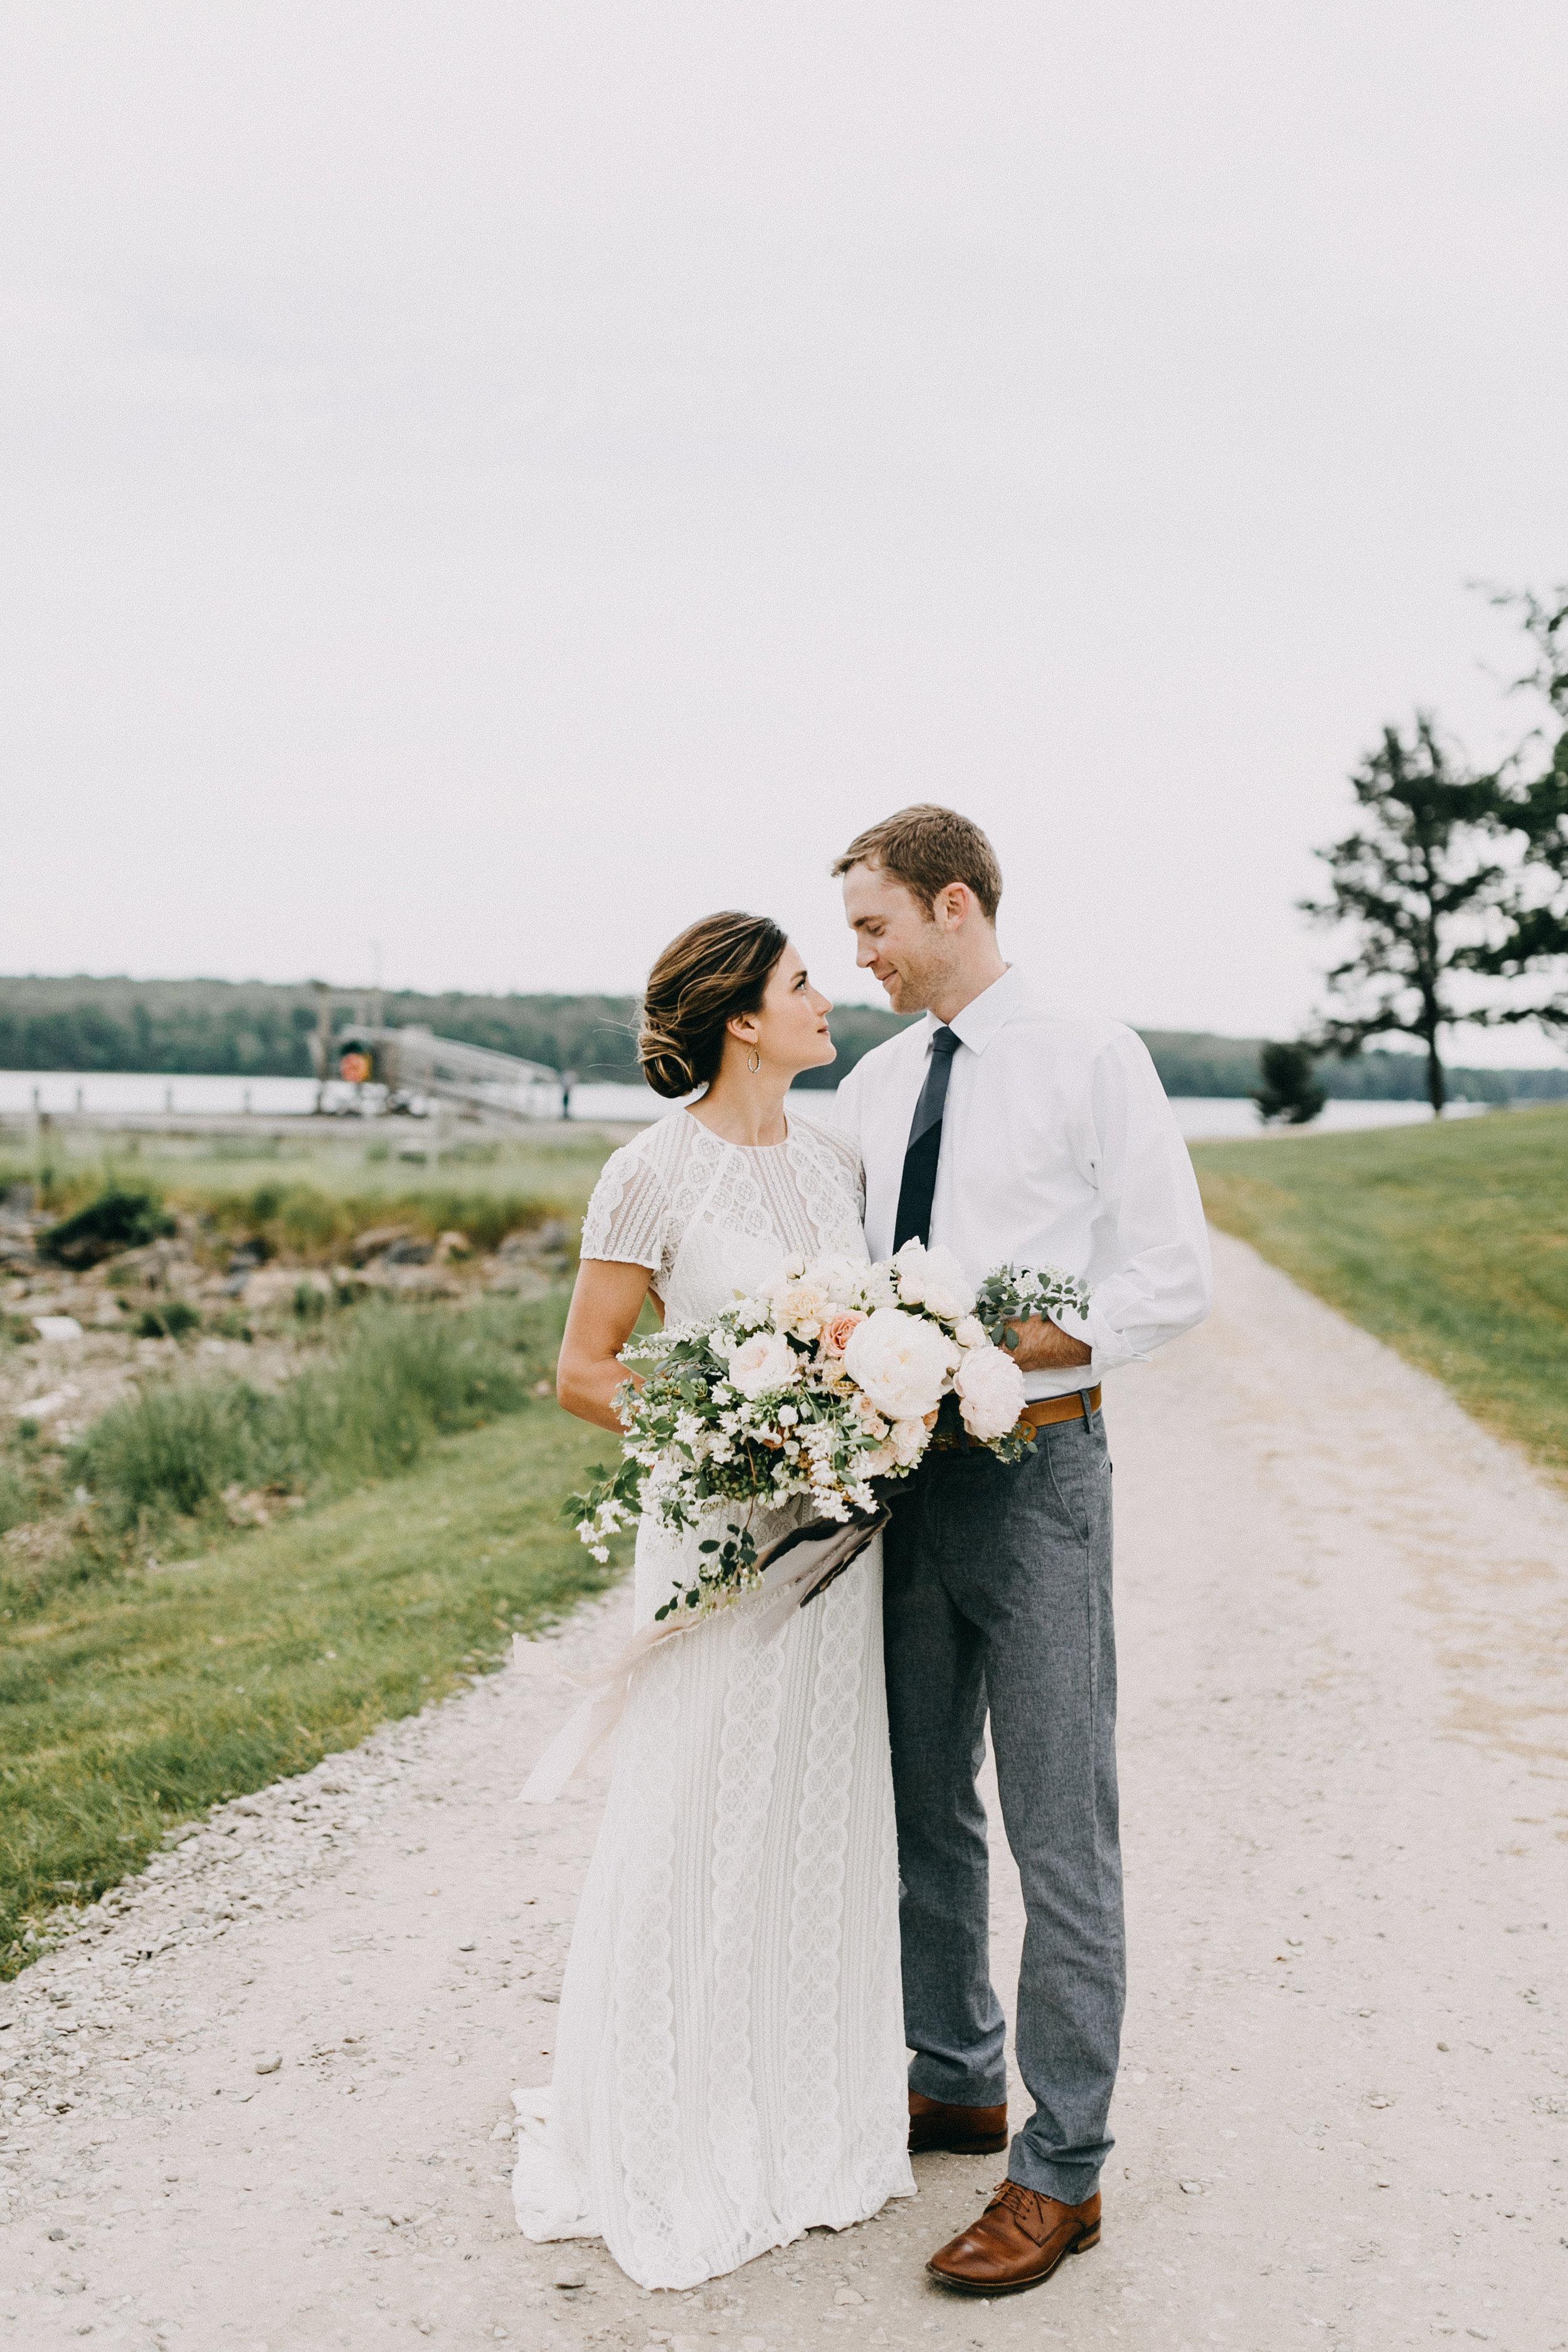 Watershed-Floral-Maine-Maritime-Wedding-Bridal-Bouquet-Centerpieces-0134.jpg